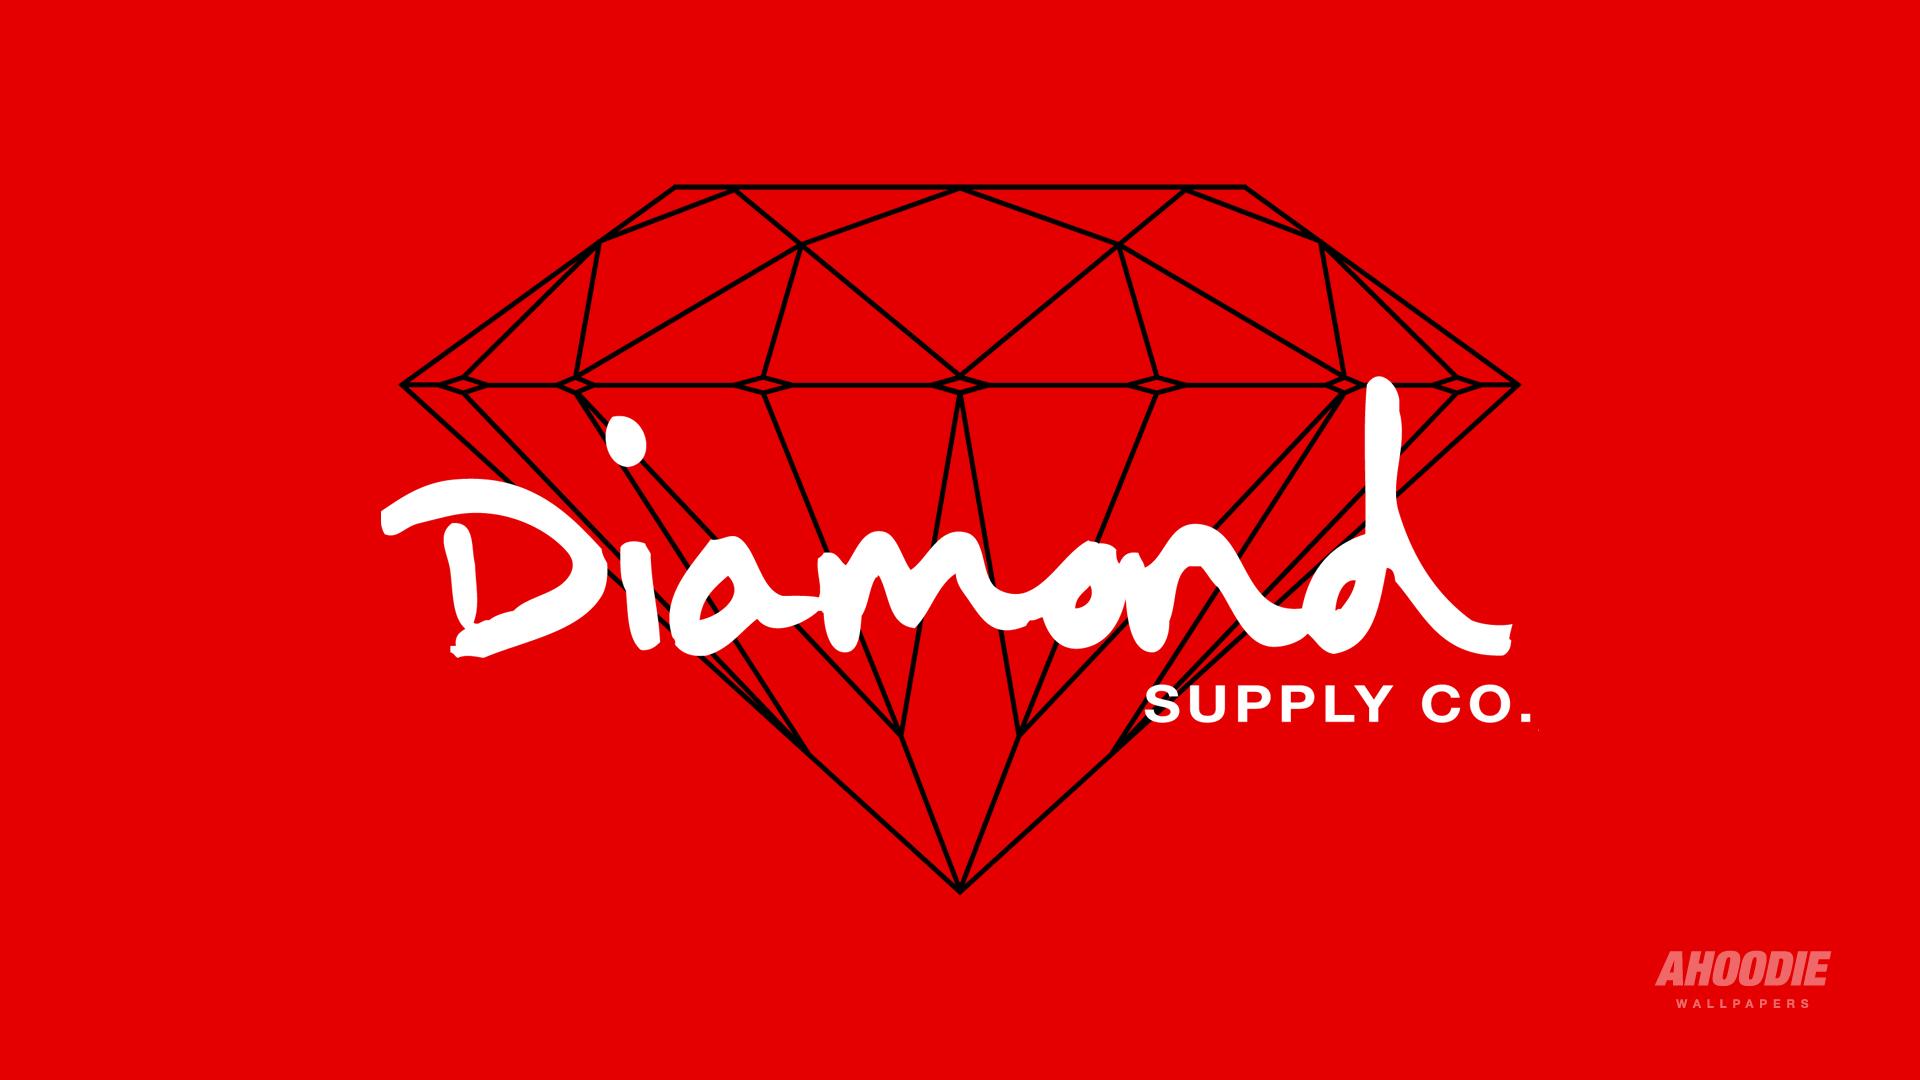 16827 Diamond Supply Co Background Wallpaper   WalOpscom 1920x1080